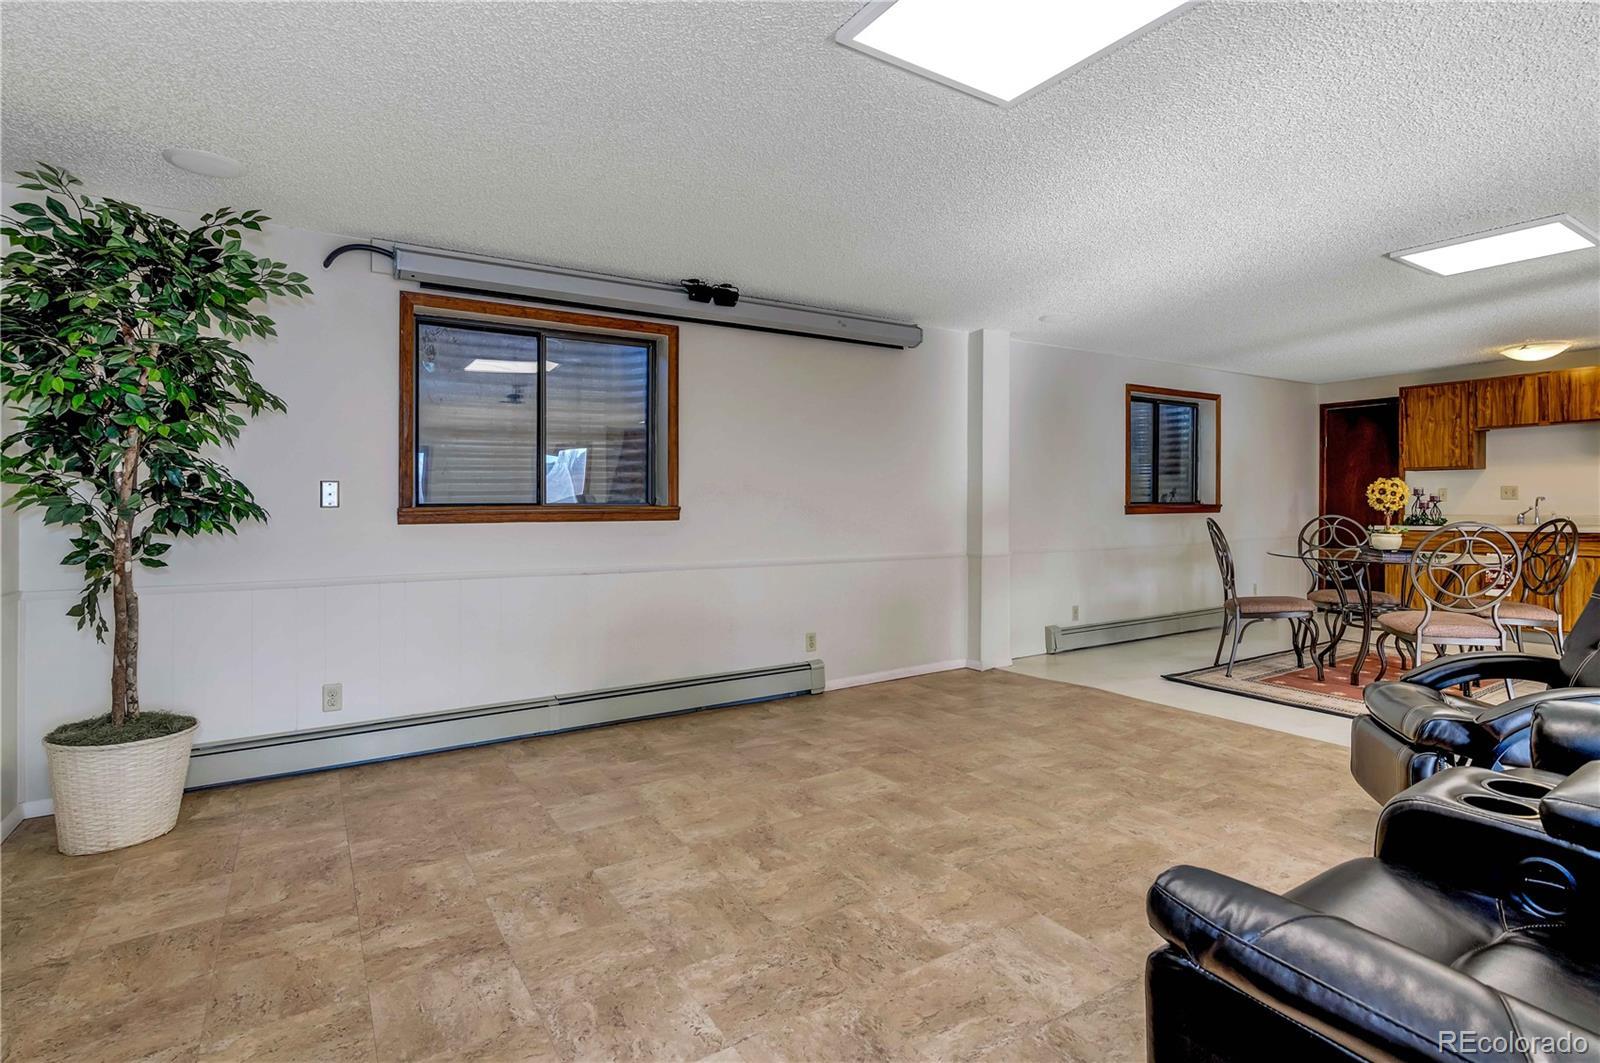 MLS# 5539974 - 26 - 5505 Saddle Rock Place, Colorado Springs, CO 80918